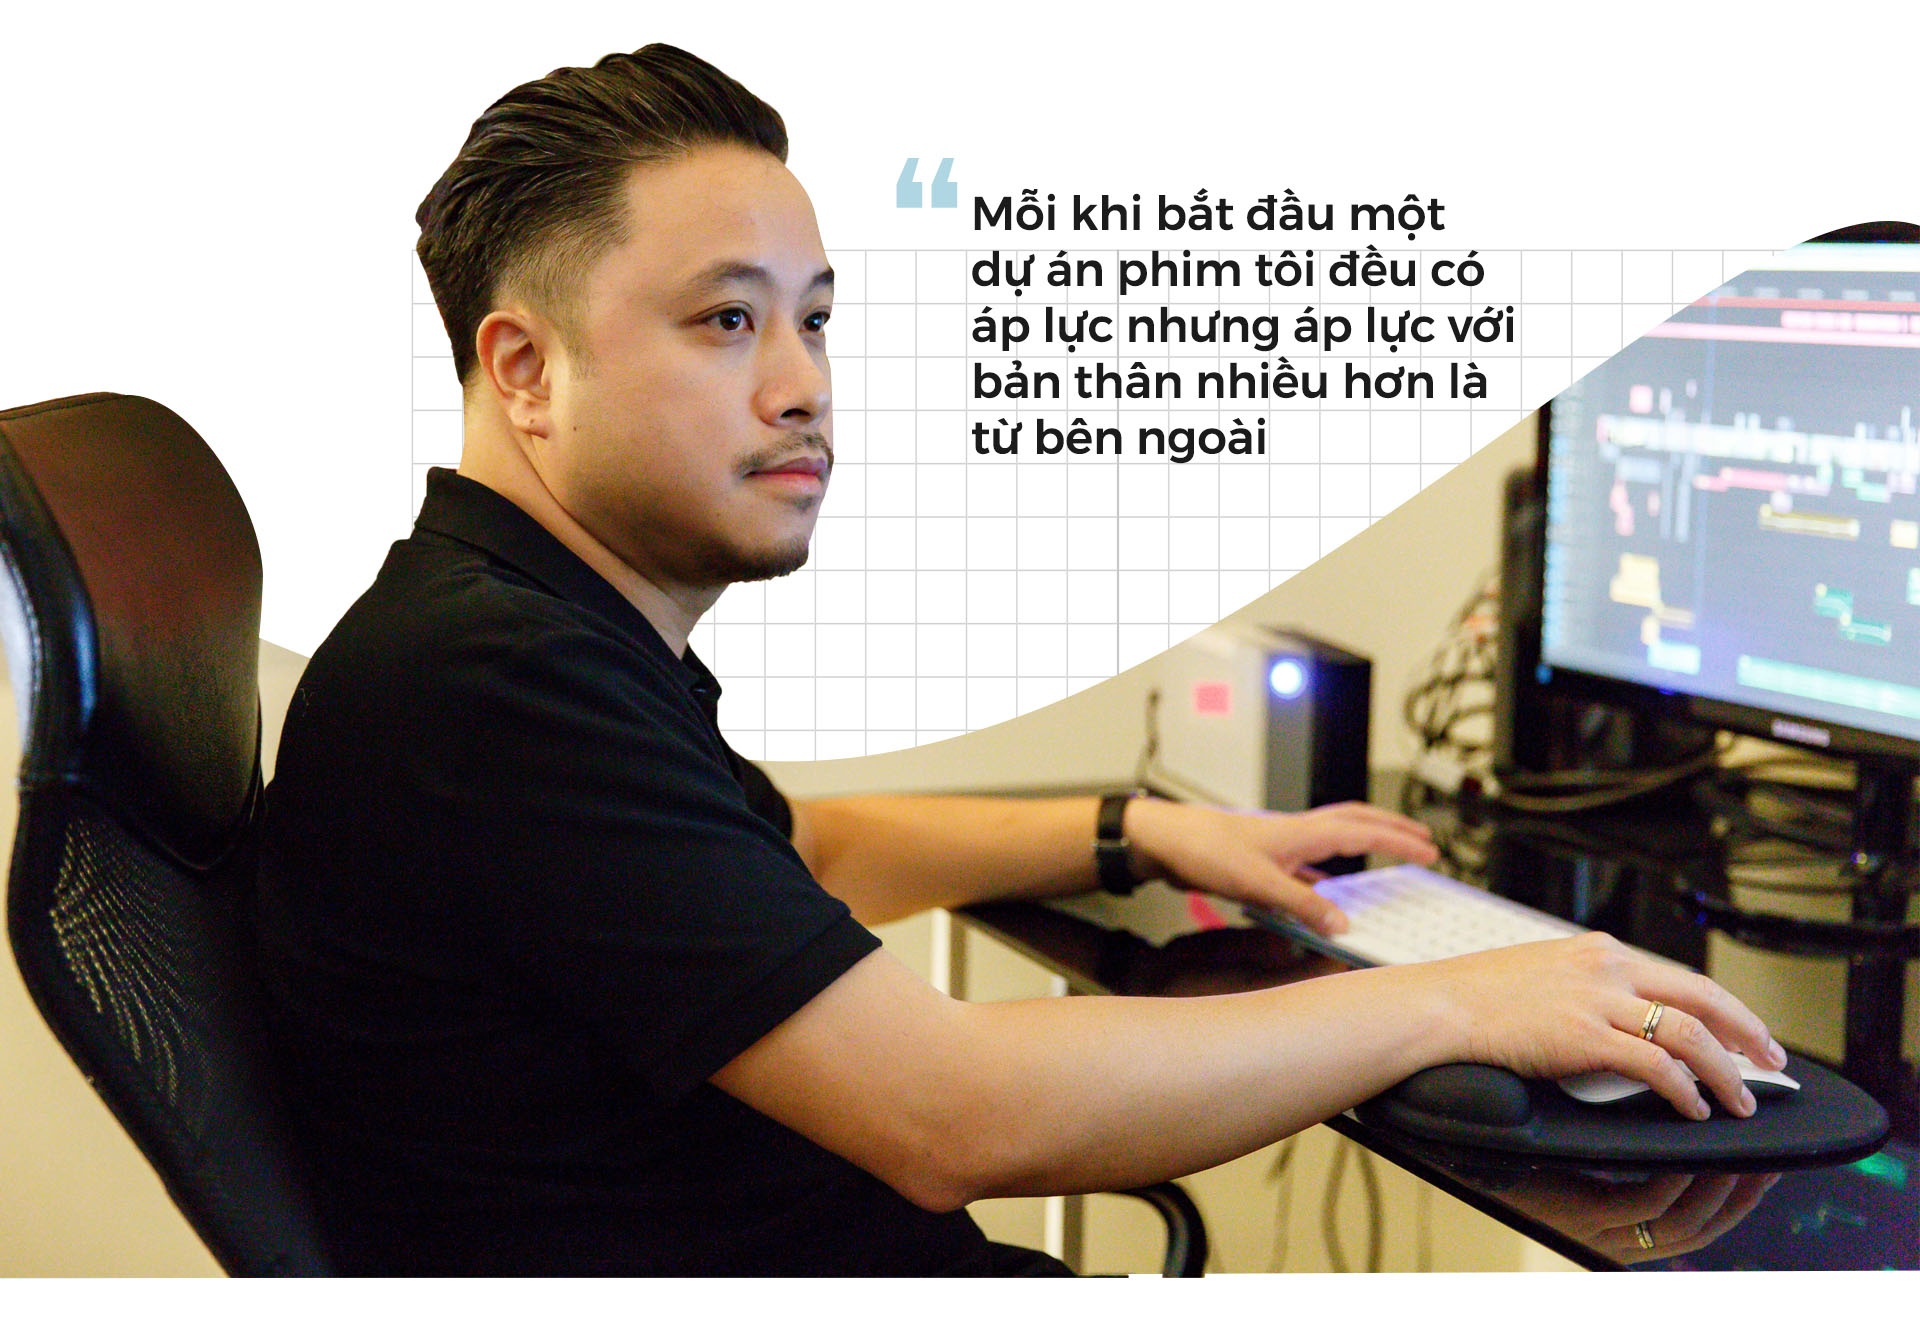 Victor Vu: Toi da xin loi Nha Phuong sau khi dap monitor o phim truong hinh anh 5